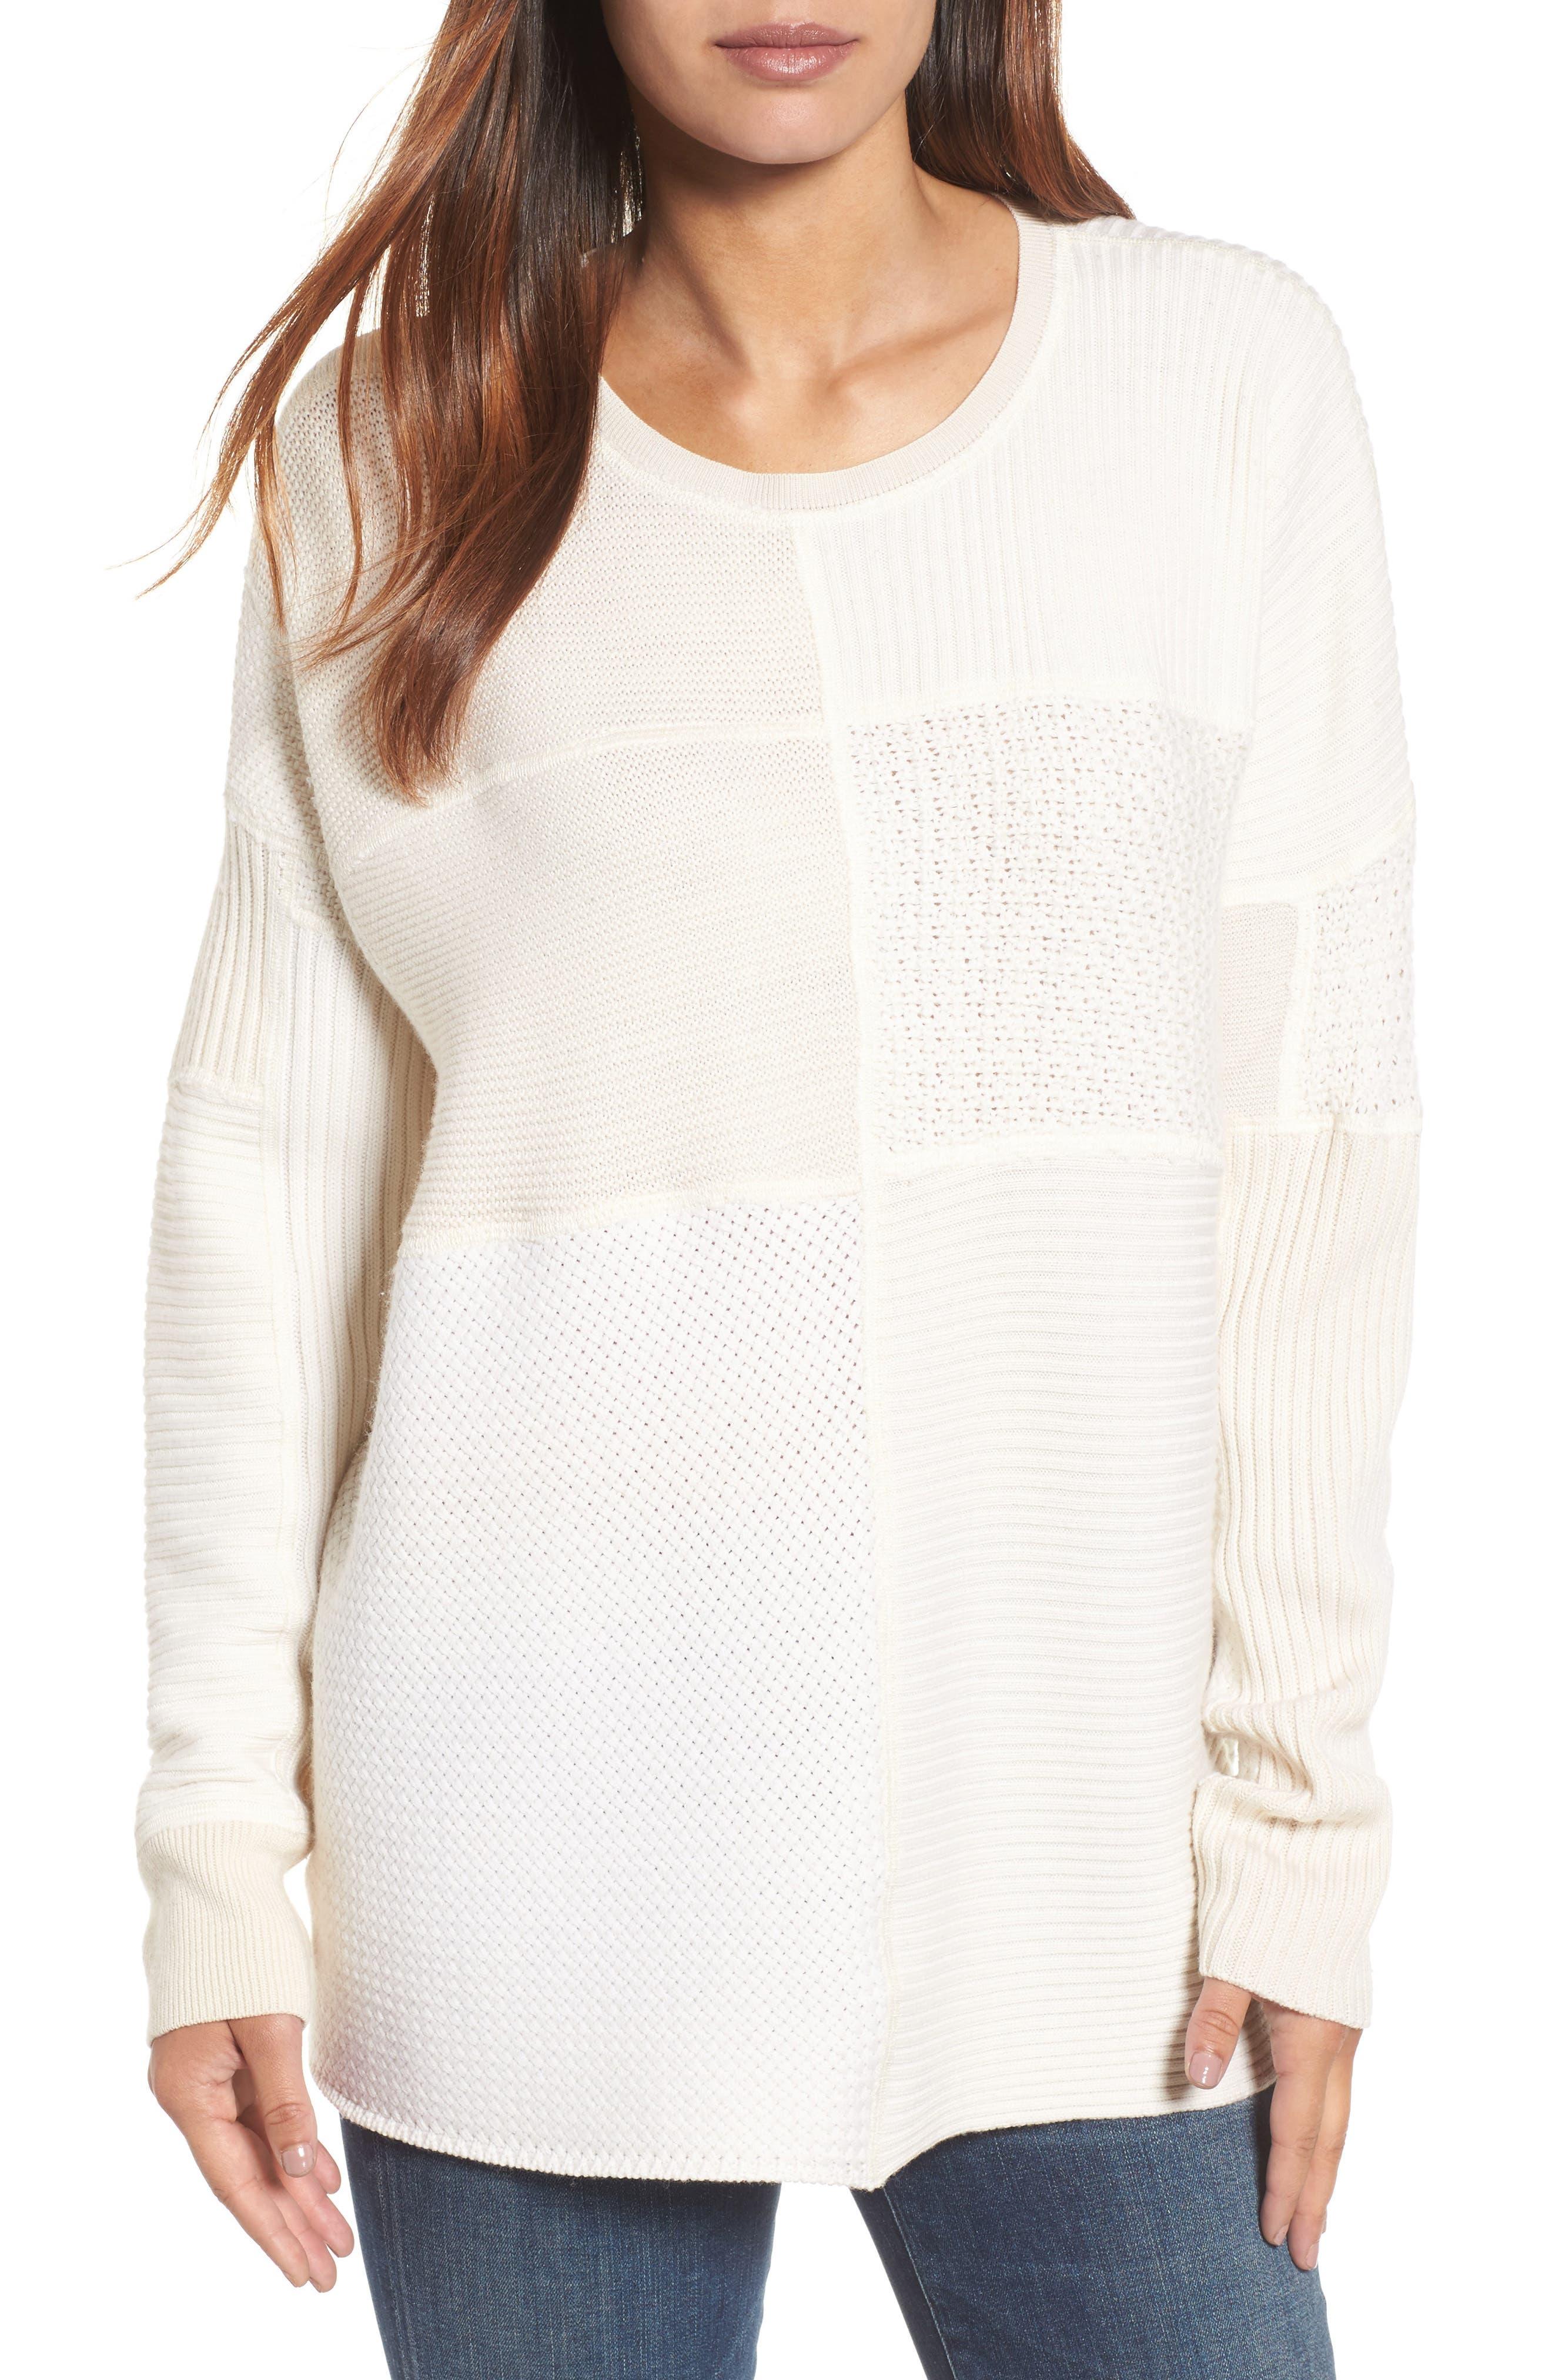 Eileen Fisher Patchwork Wool Sweater (Nordstrom Exclusive)